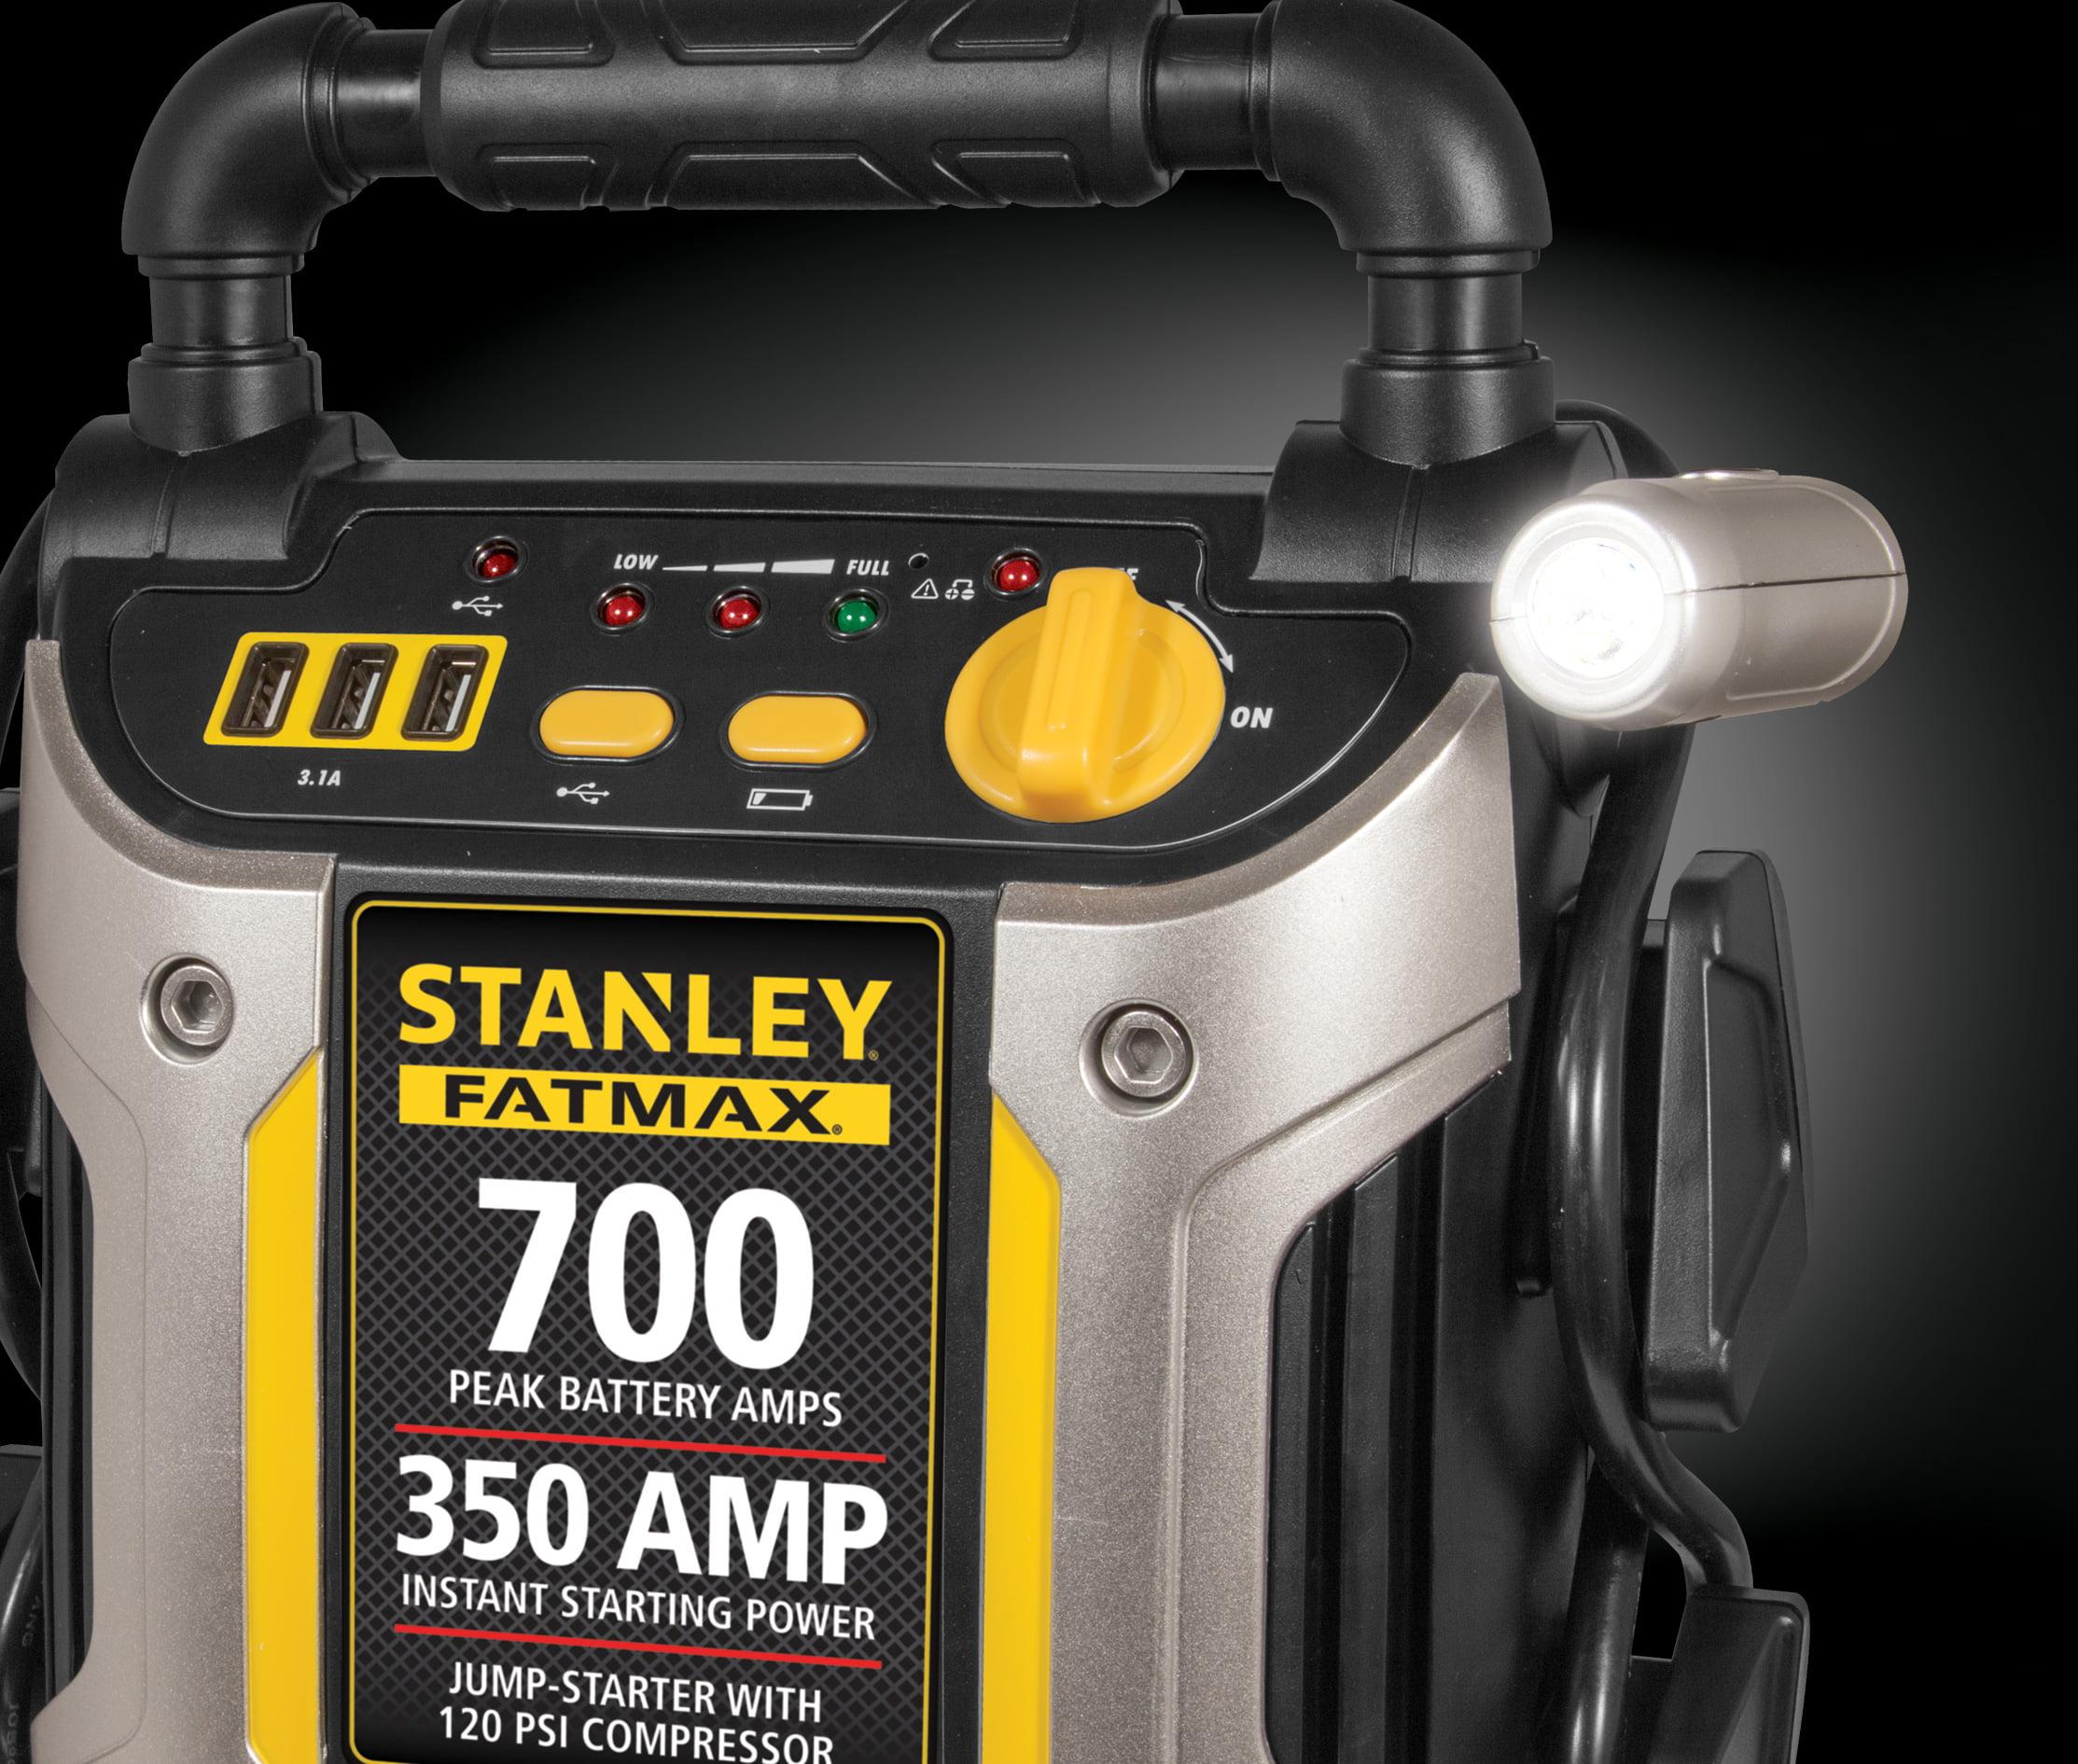 Stanley Fatmax 700 Amp Peak Jump Starter With Compressor J7cs